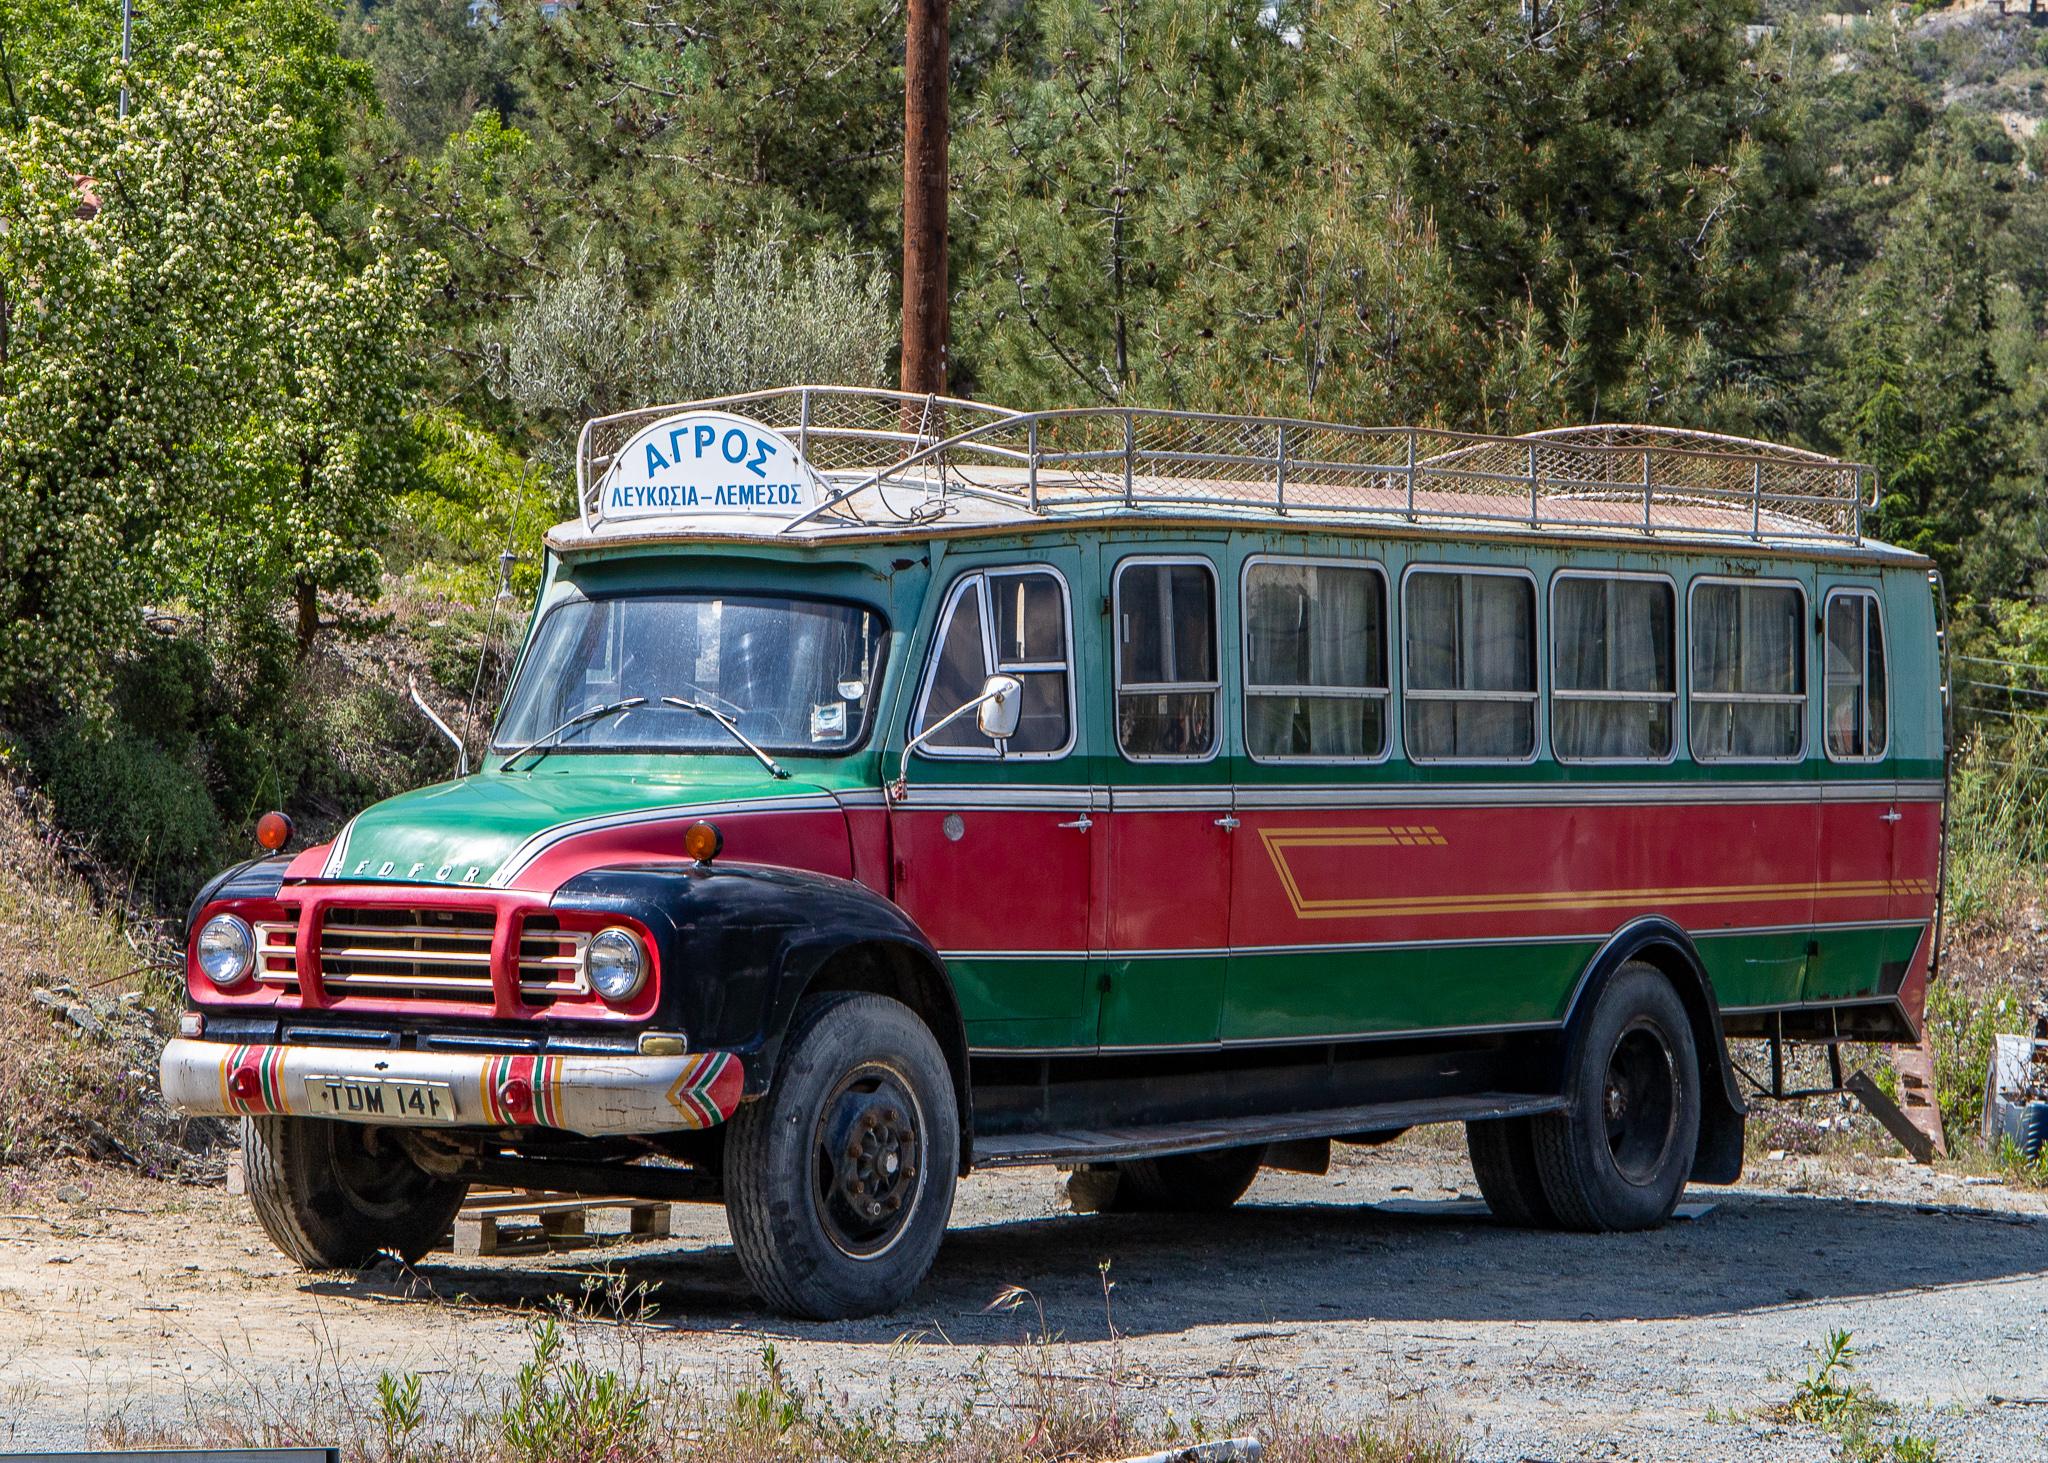 Local transport options